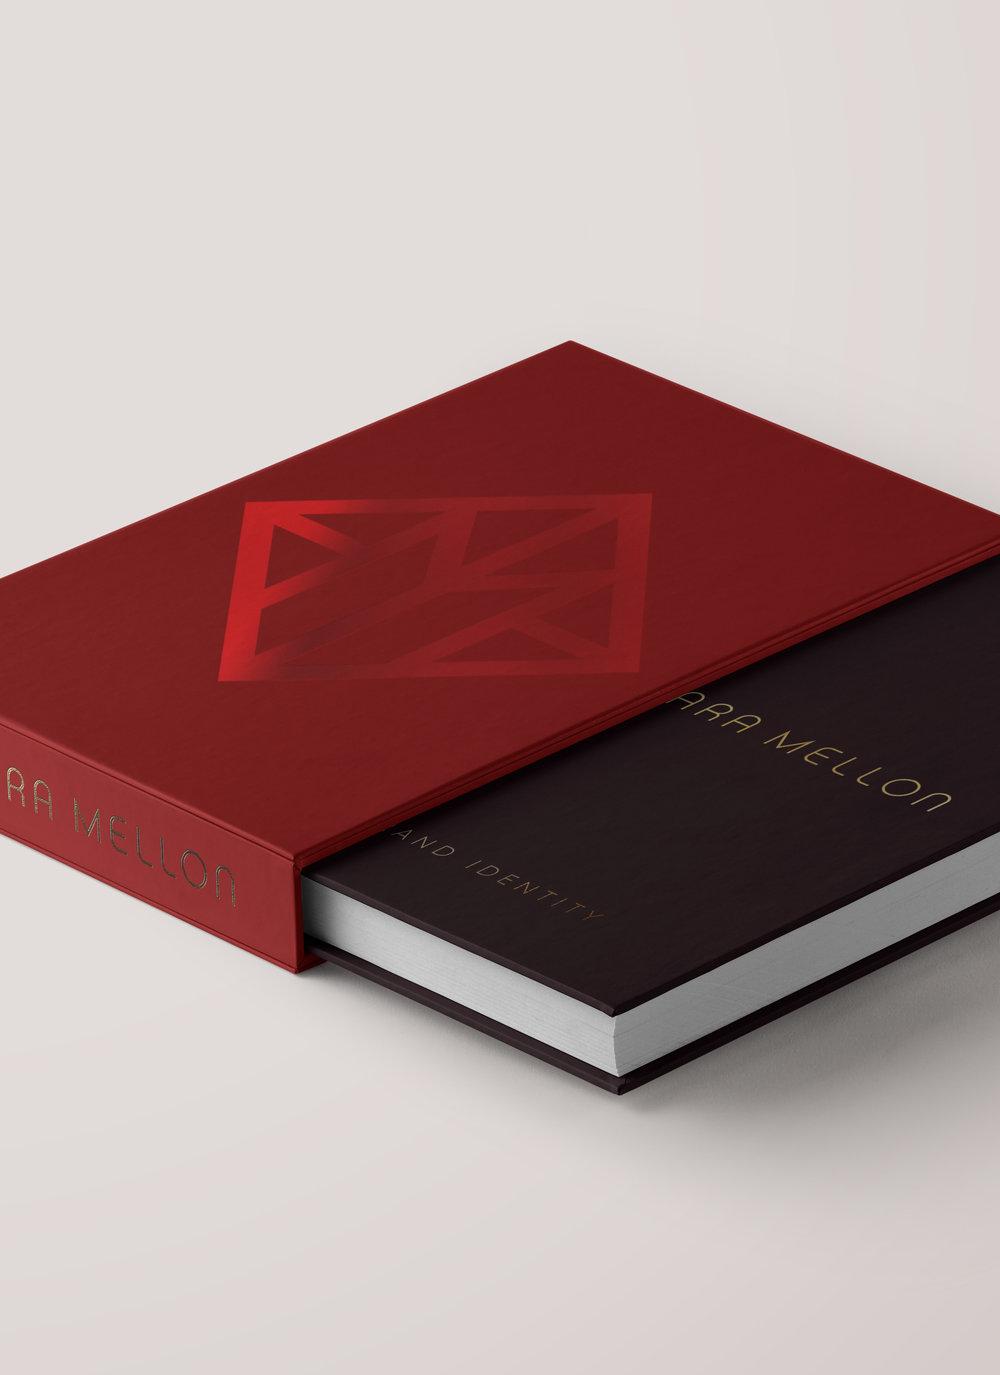 Brandbook Slipcase